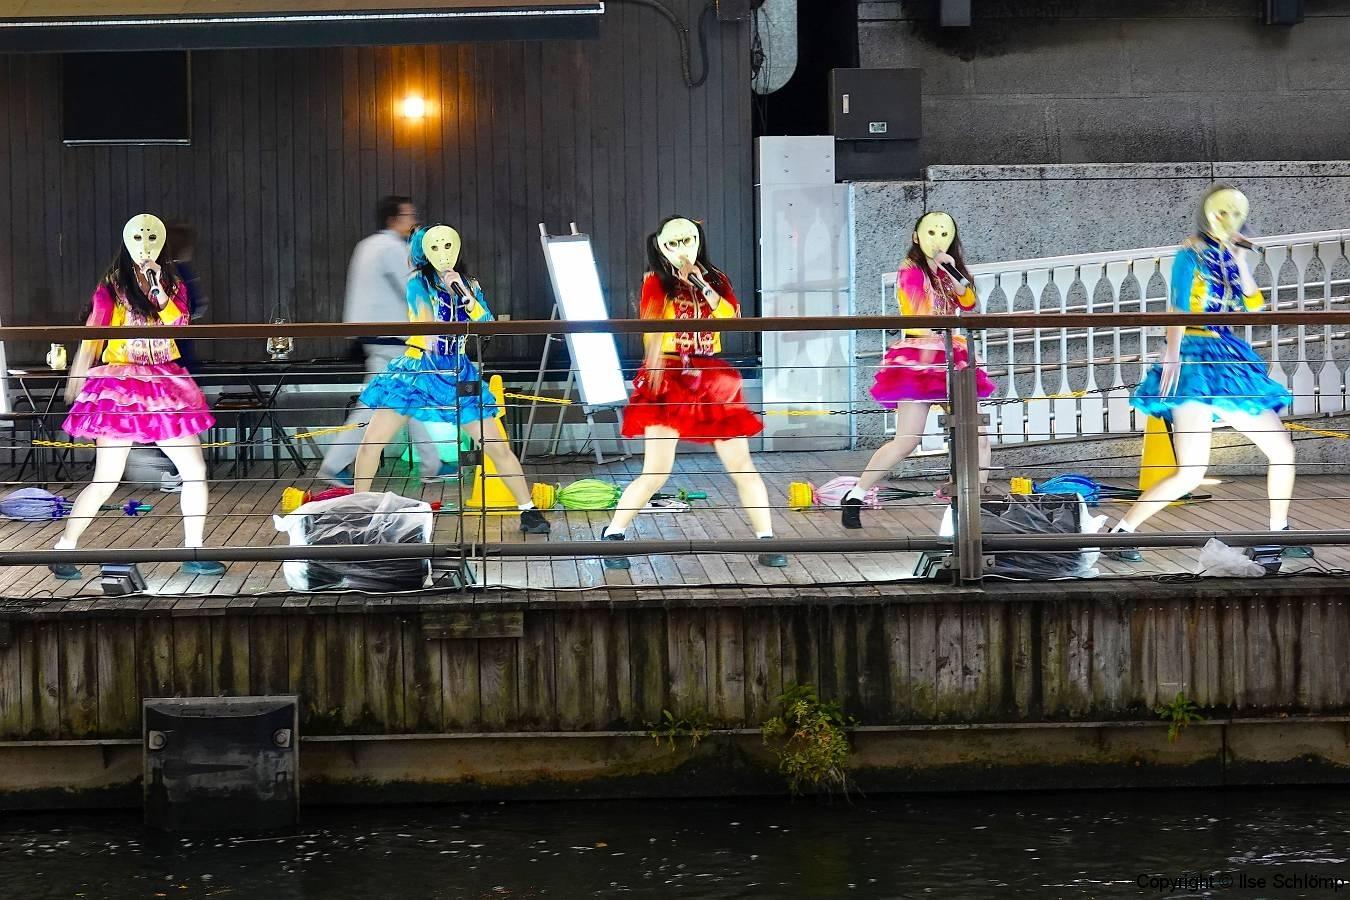 Japan, Osaka, Dotonbori, Gesangsgruppe am Kanal